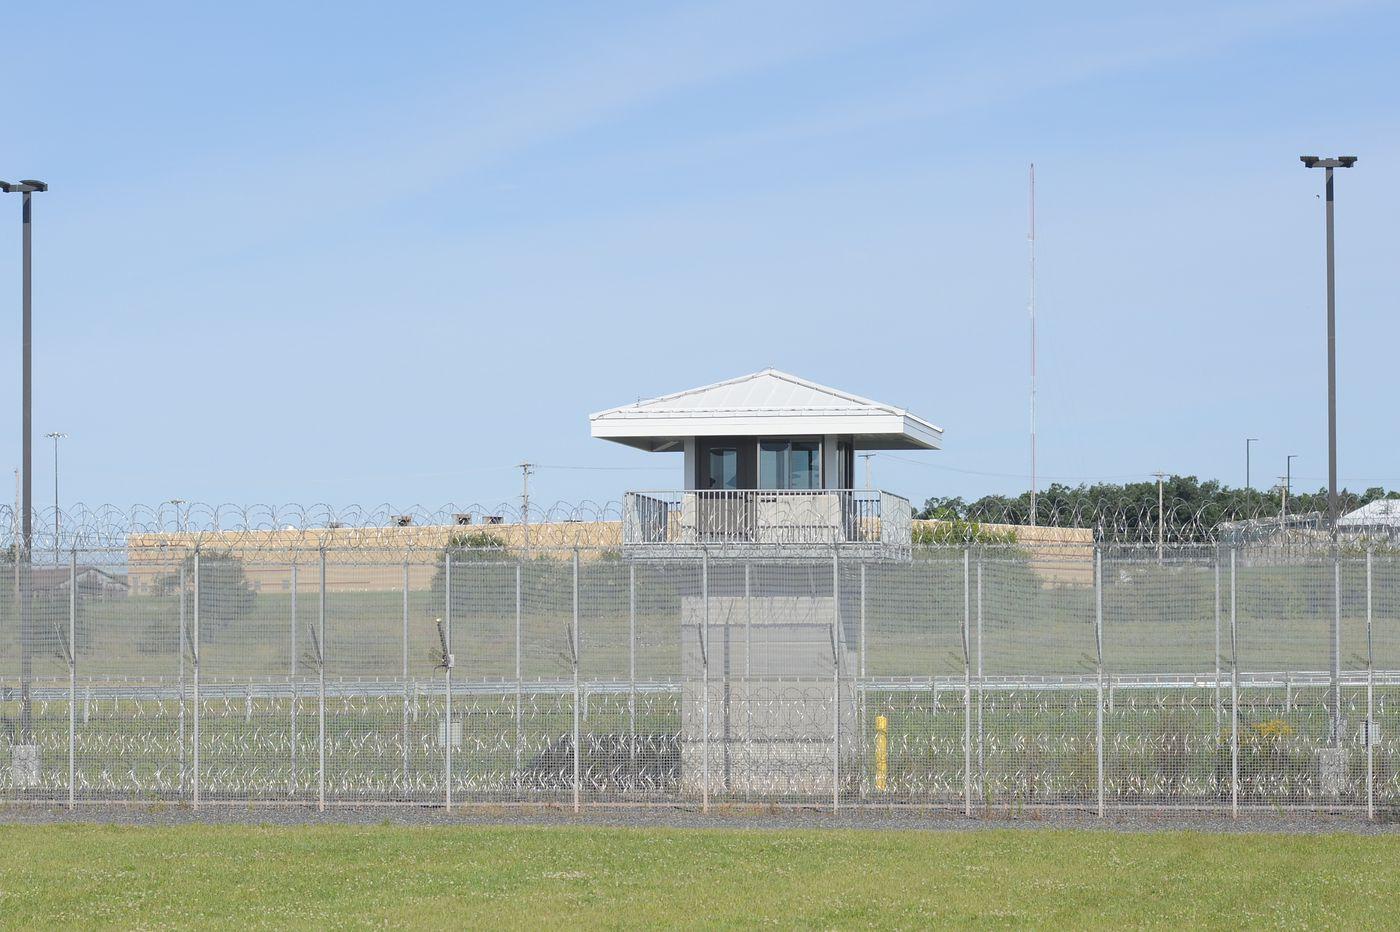 Pennsylvania prisons' unreliable COVID data hides the true extent of the crisis | Editorial